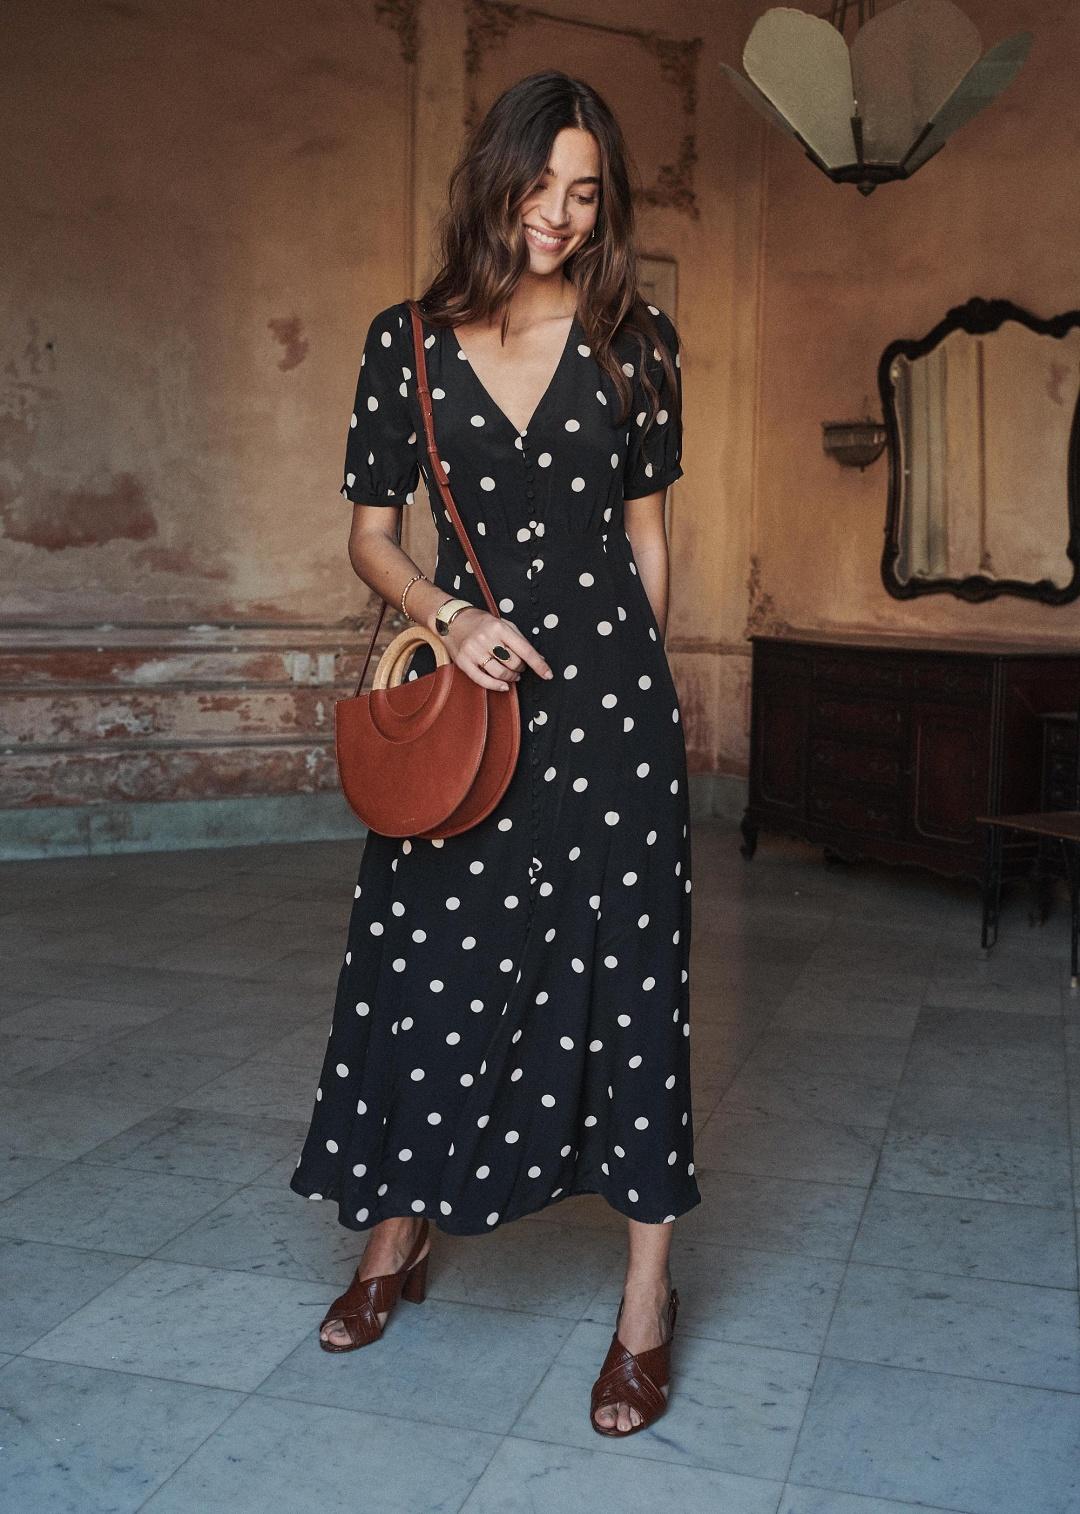 Sézane - Sollie dress